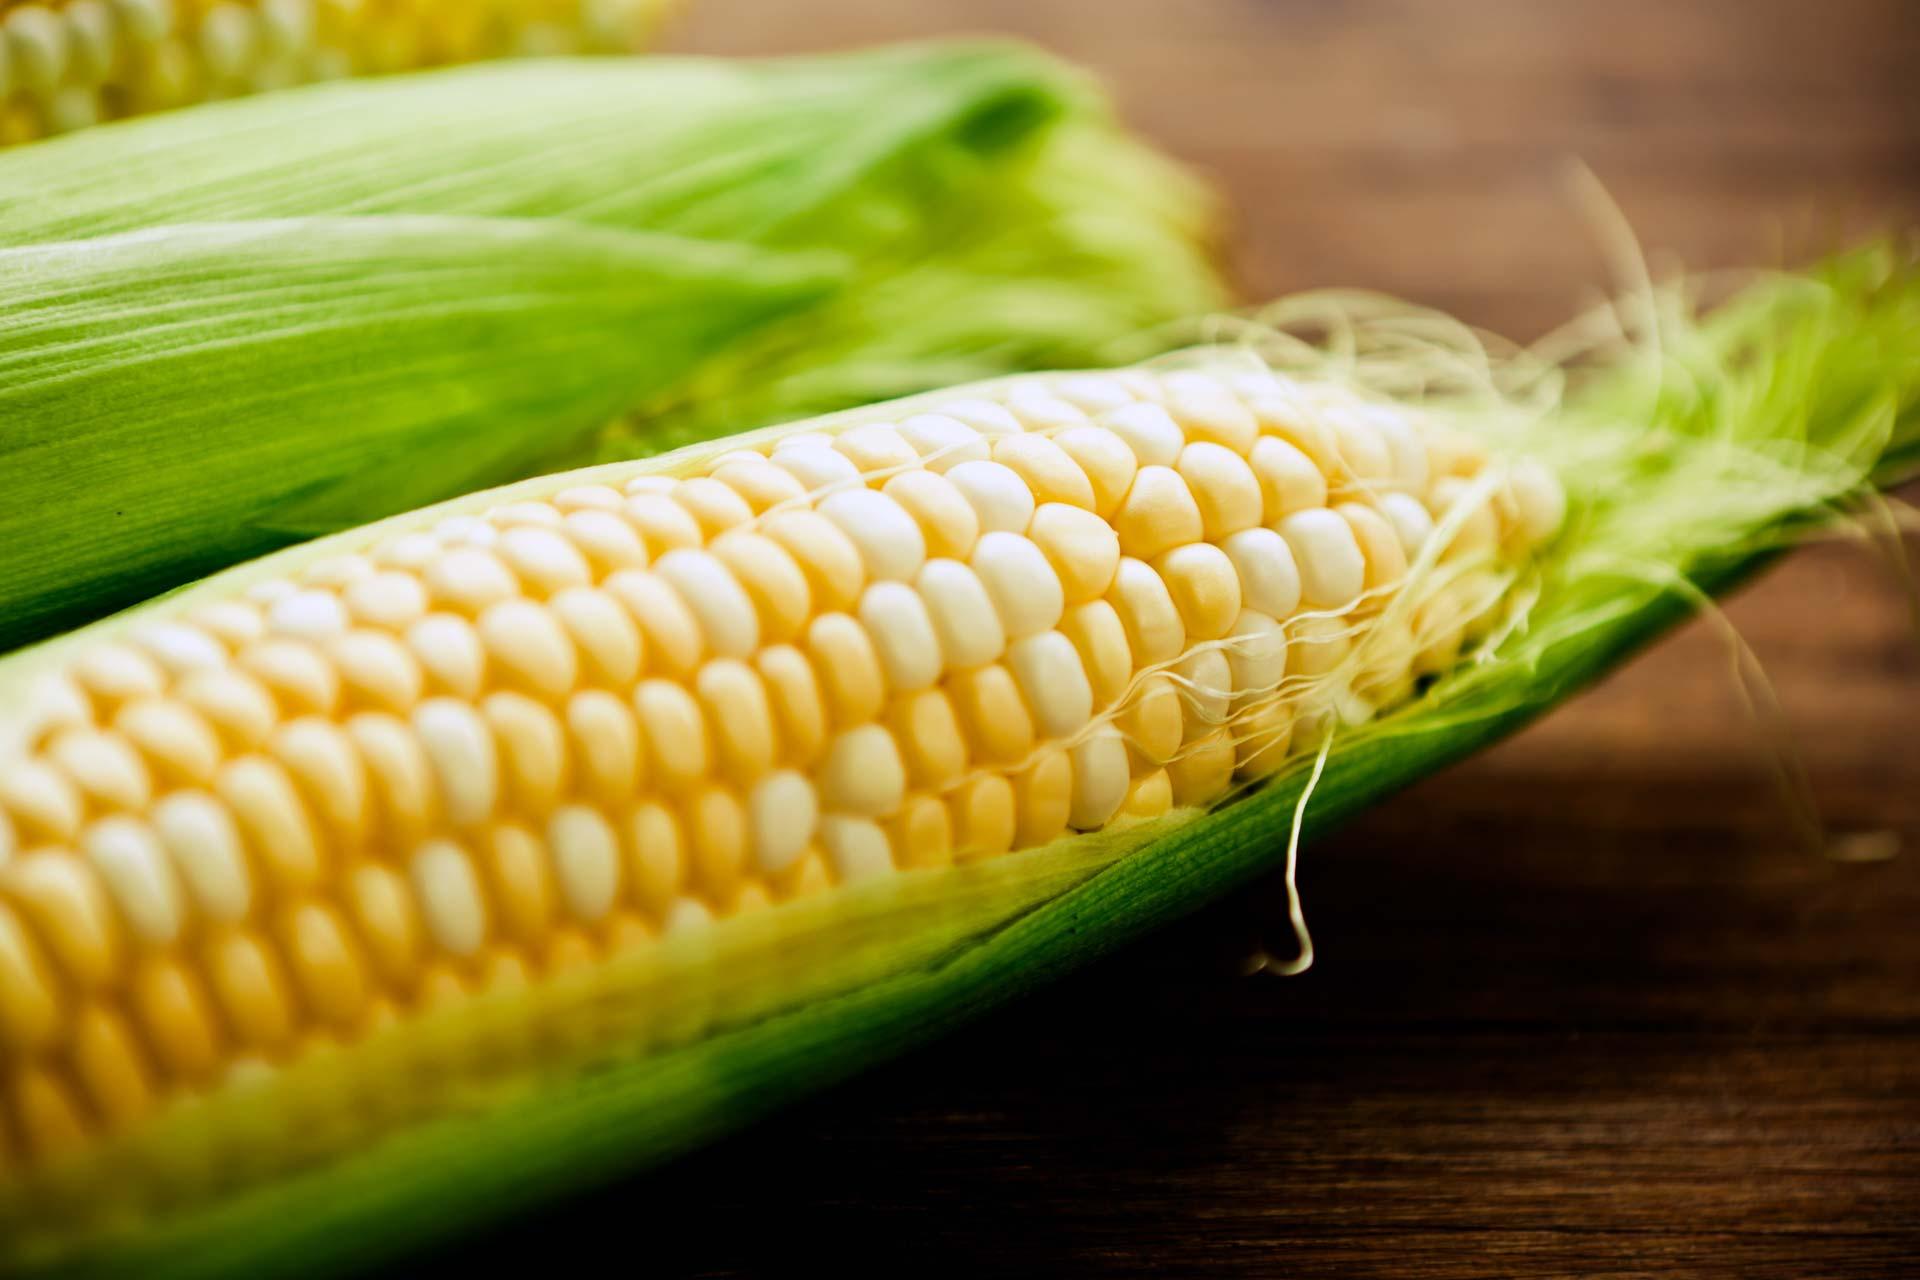 Fresh uncooked corn on the cob